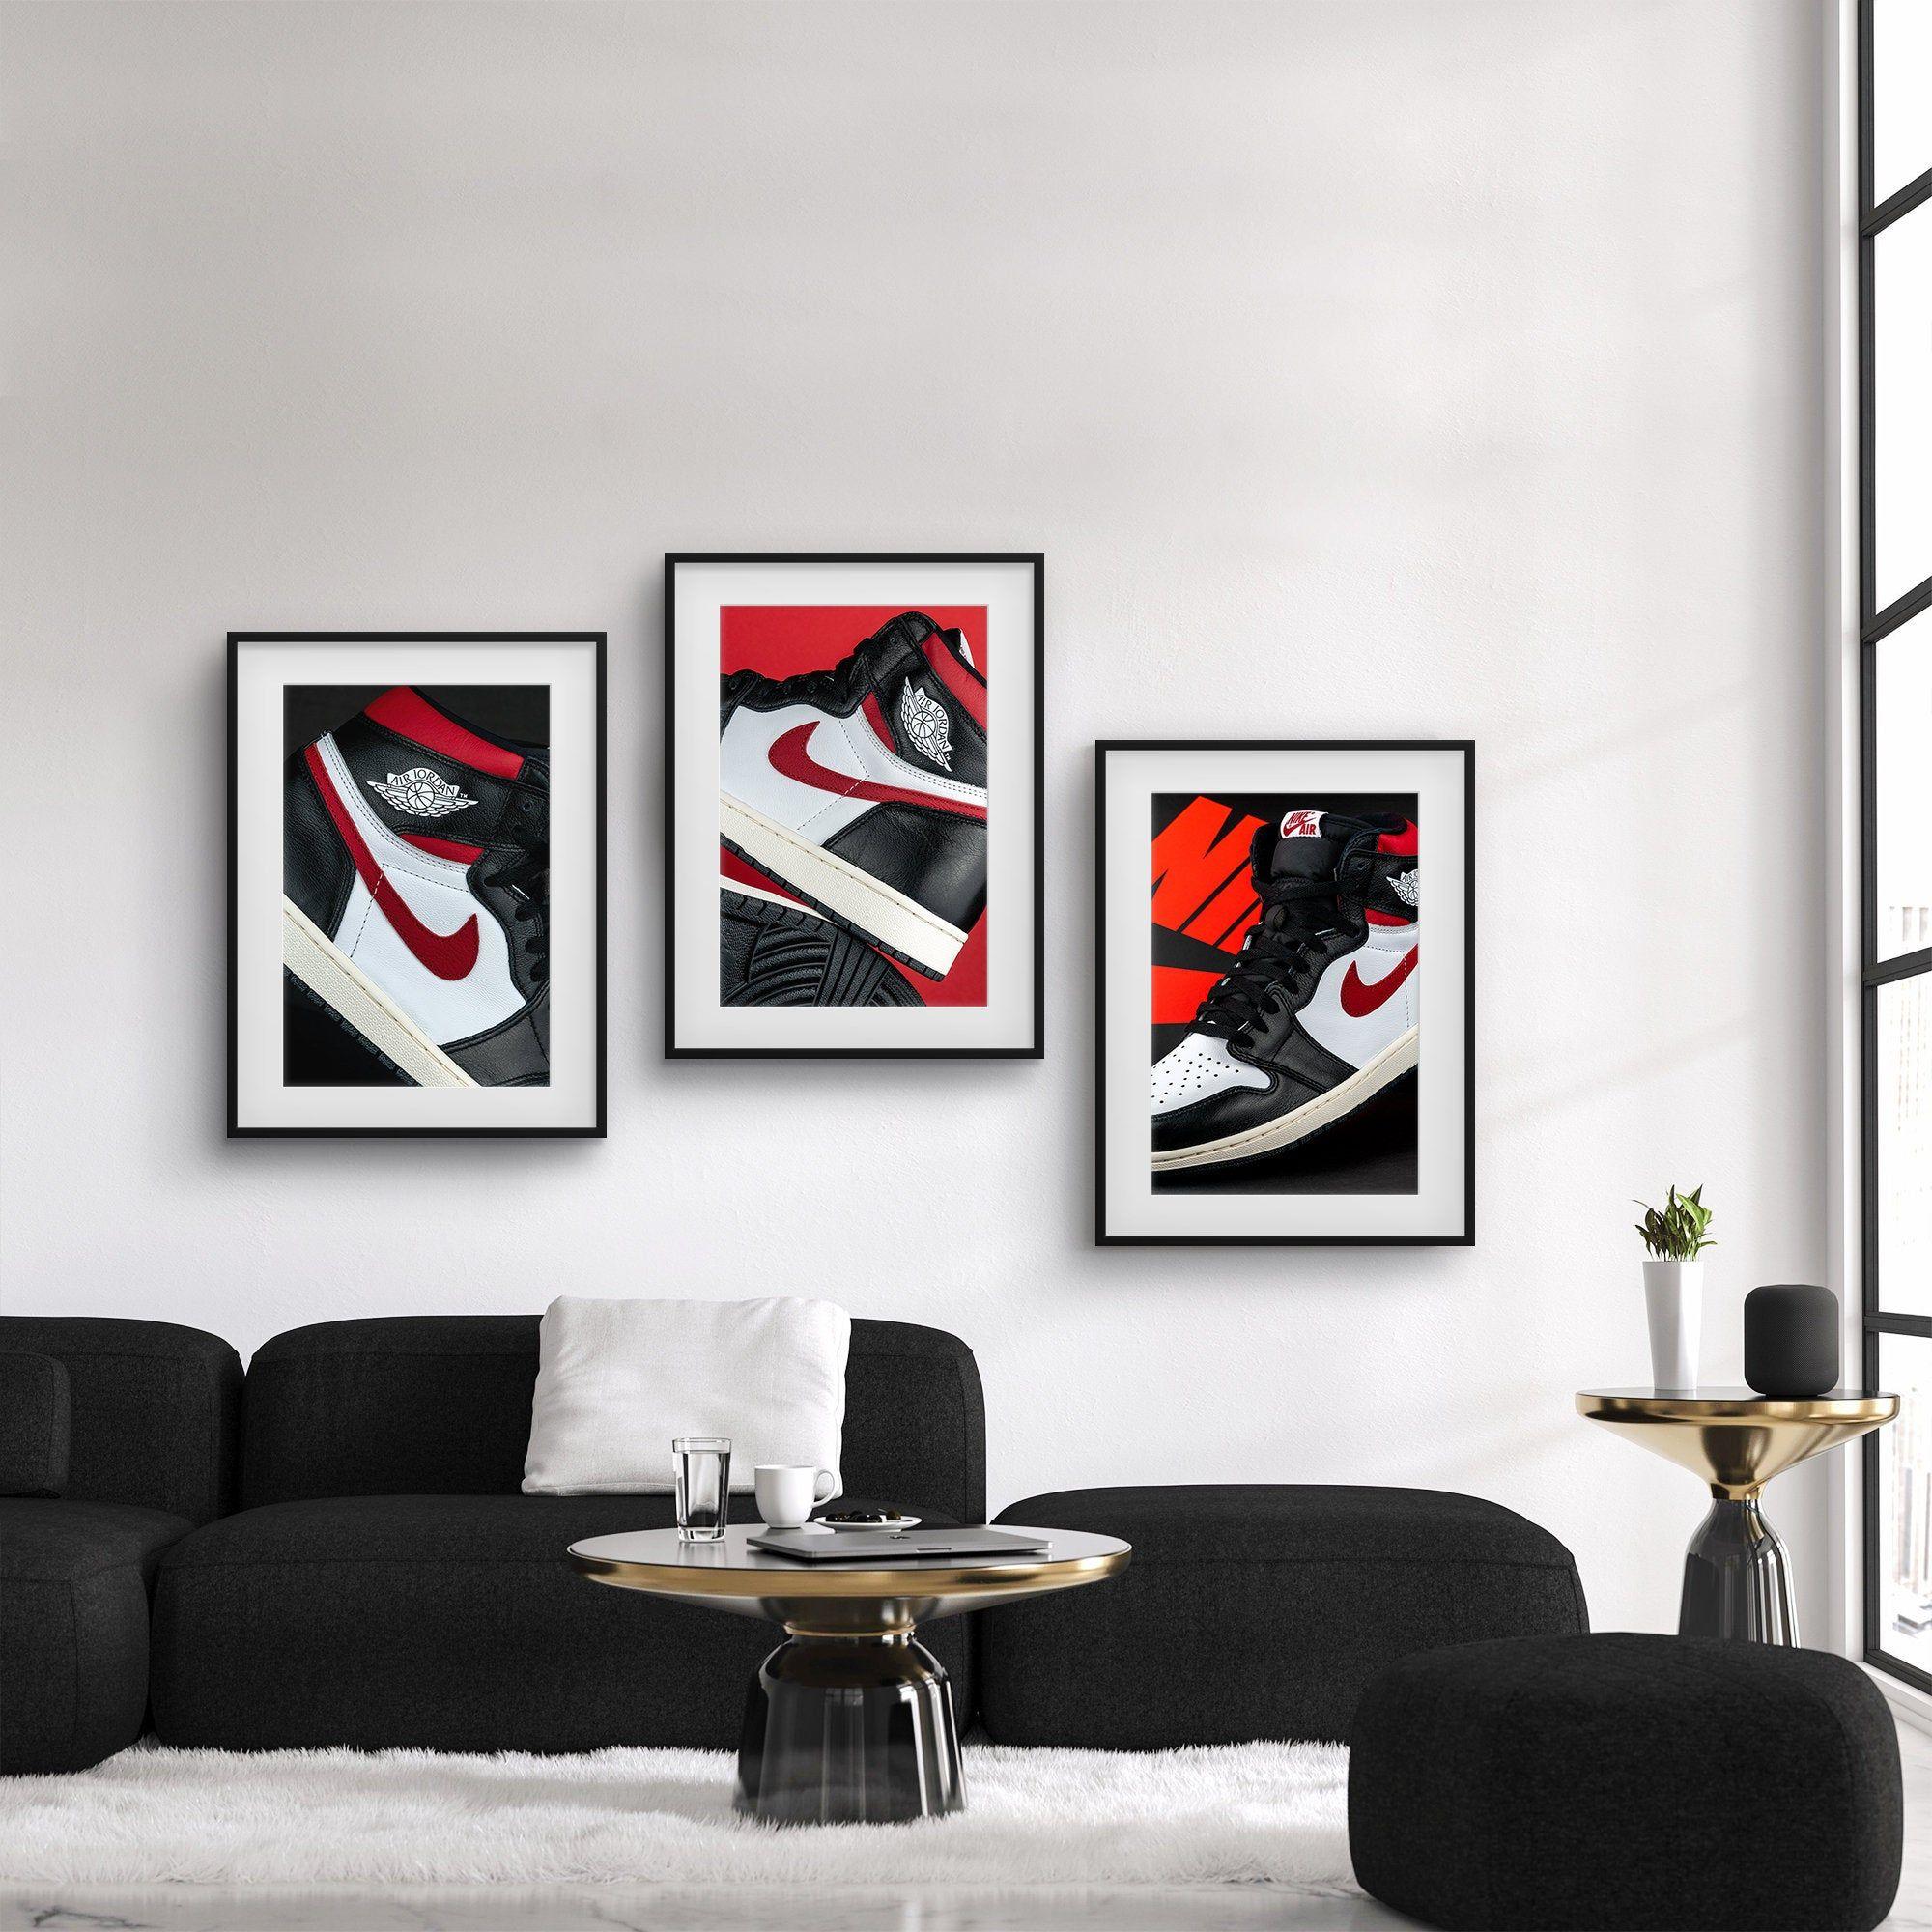 Air Jordan 1 Bred Sneaker Collection | Sneakerhead room ...